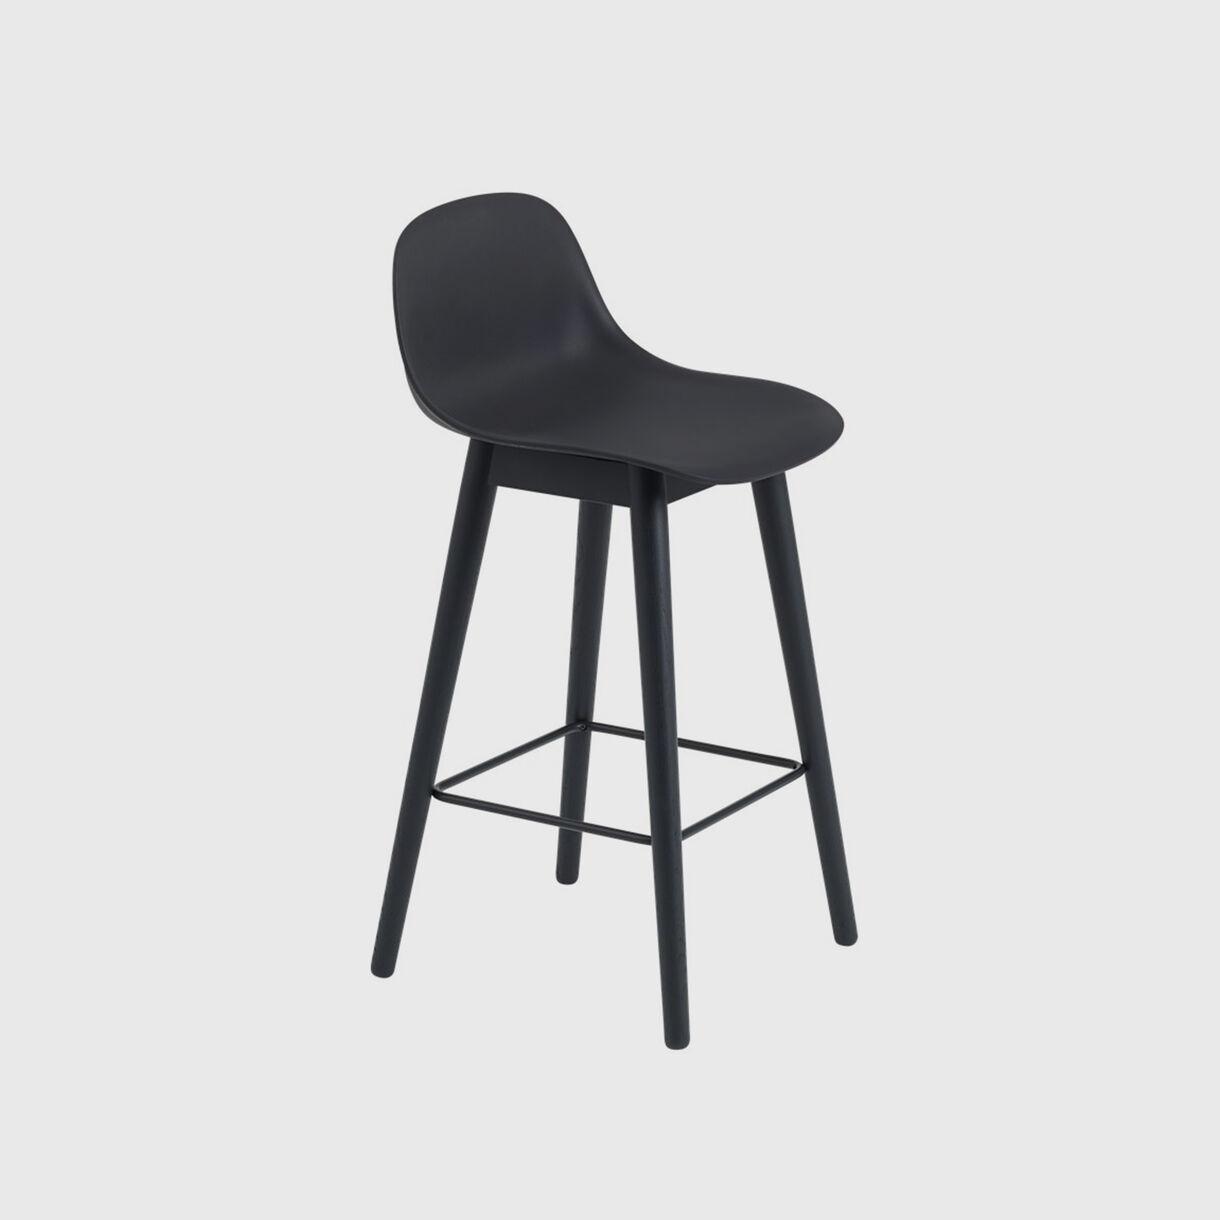 Fiber Counter Stool with Backrest Wood Base, Black